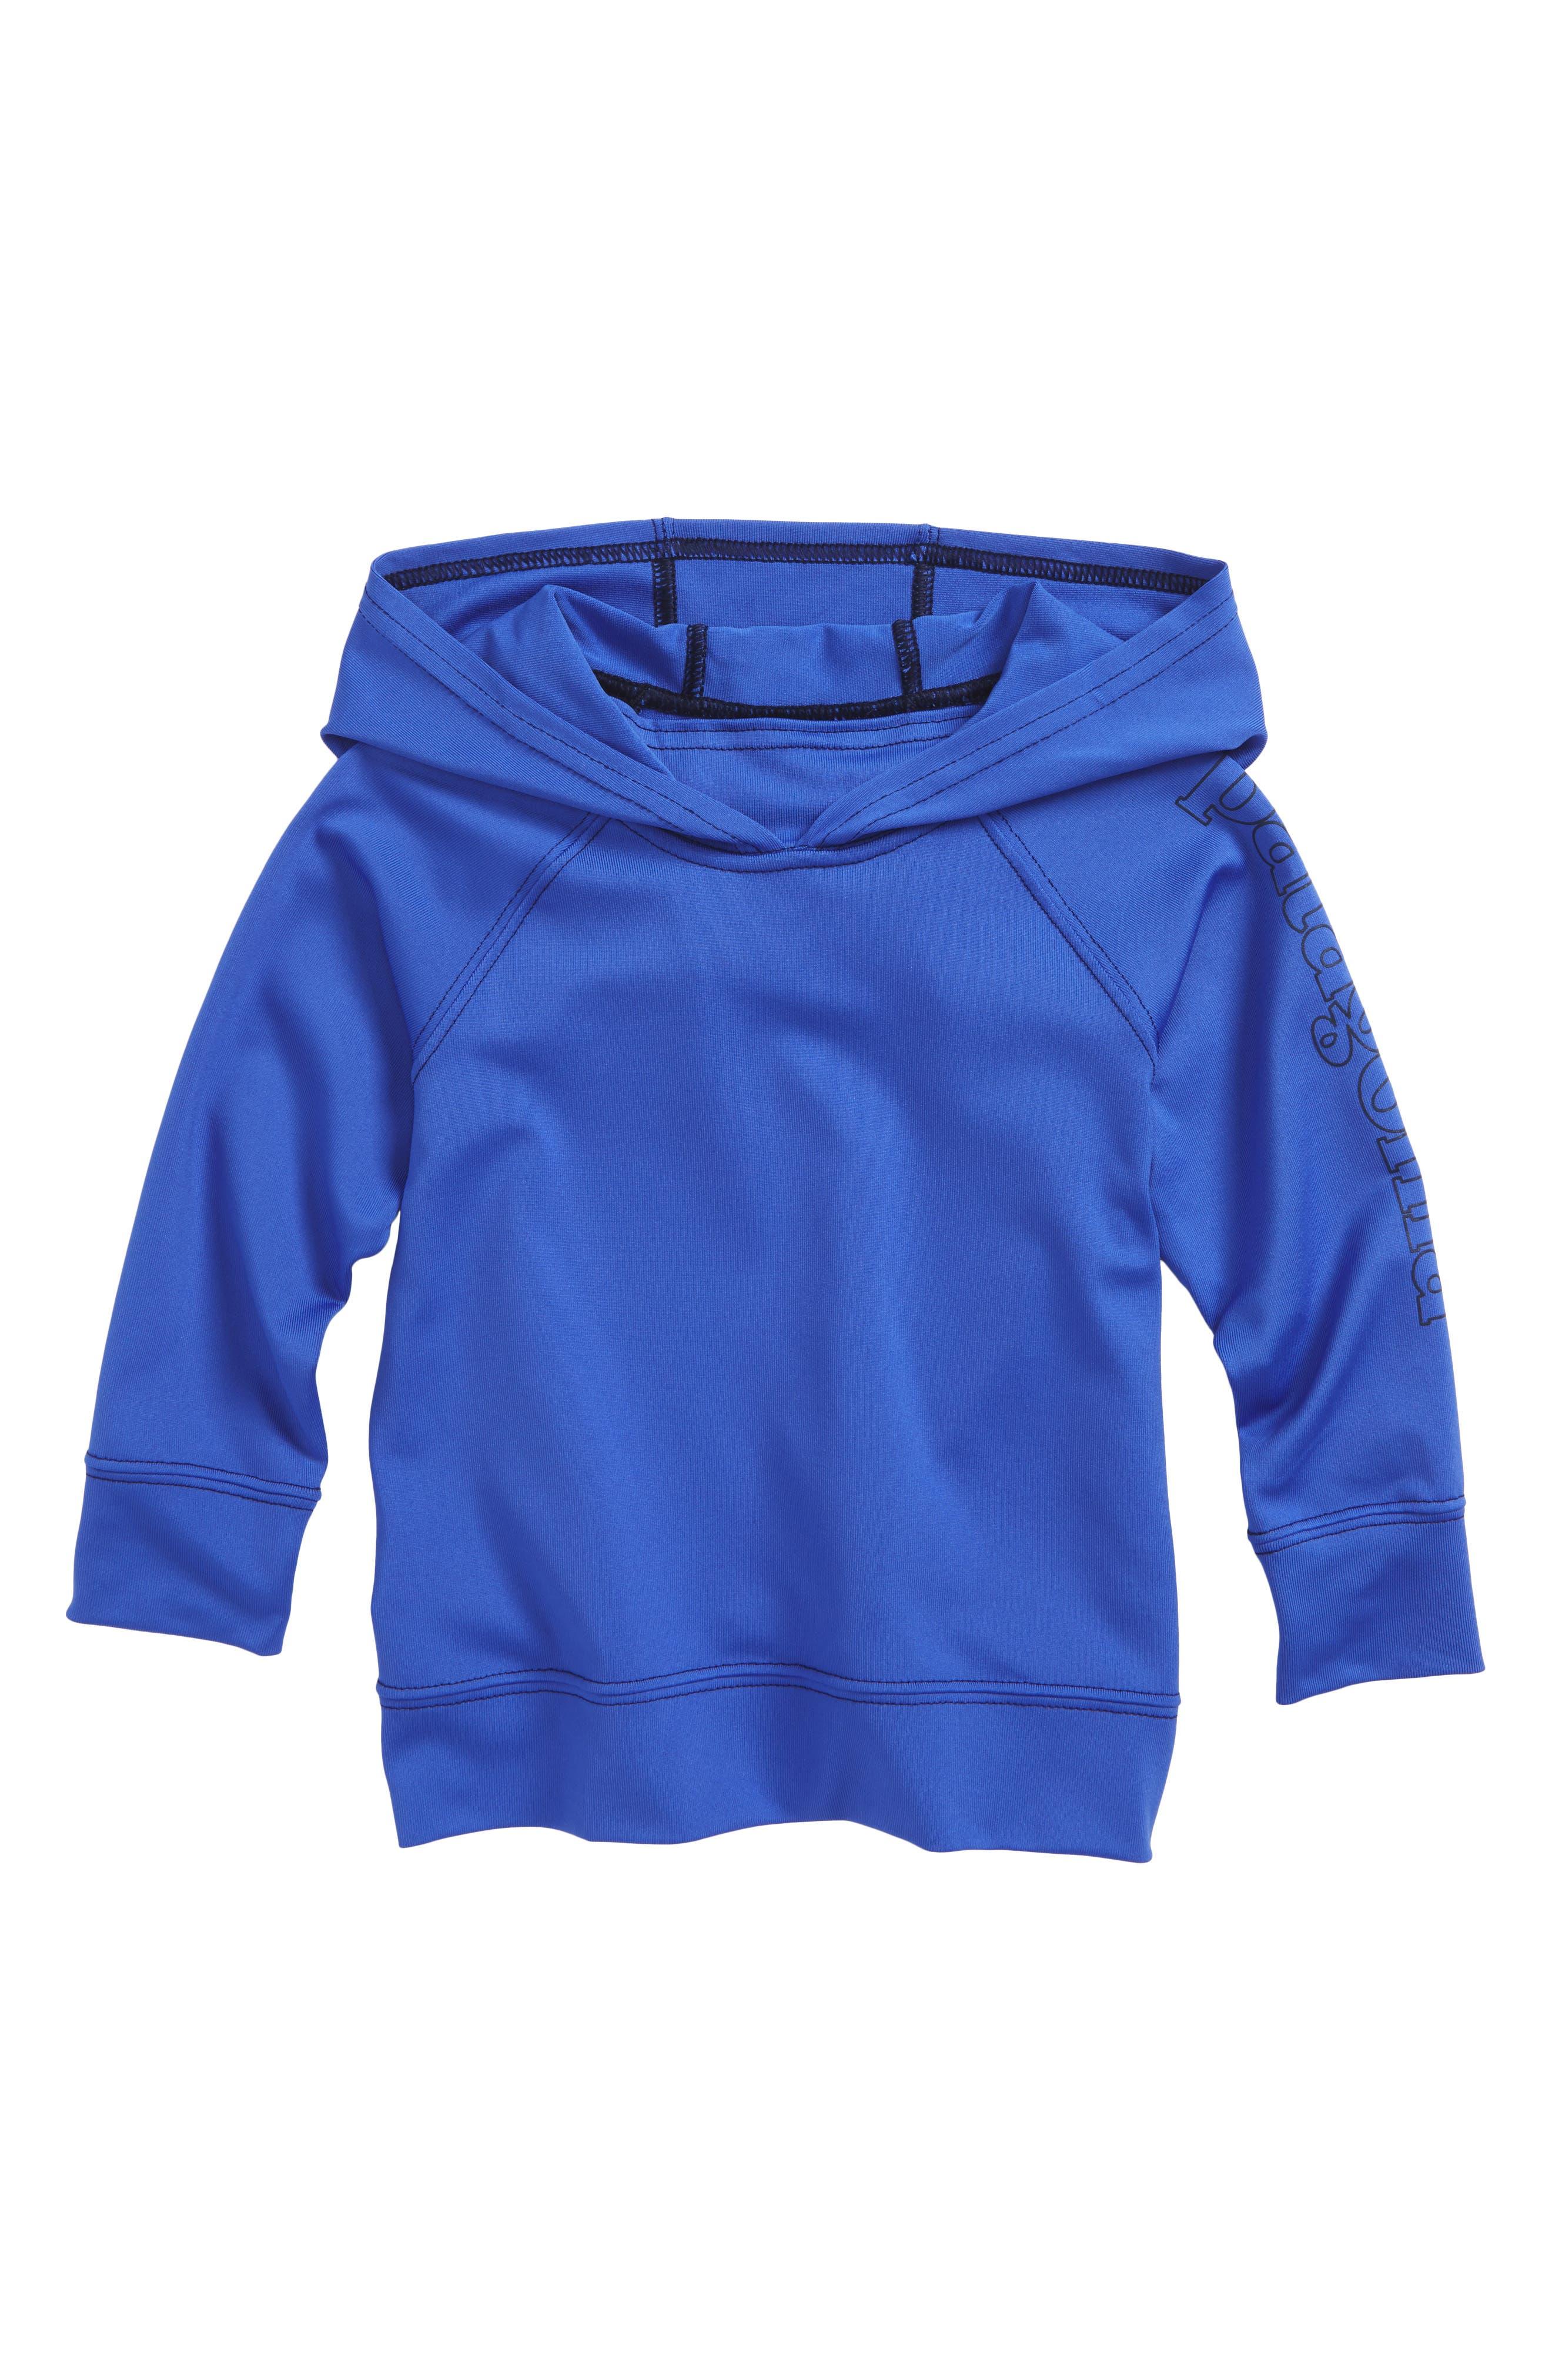 Capilene<sup>®</sup> Sun Hoodie,                             Main thumbnail 1, color,                             Imb Imperial Blue